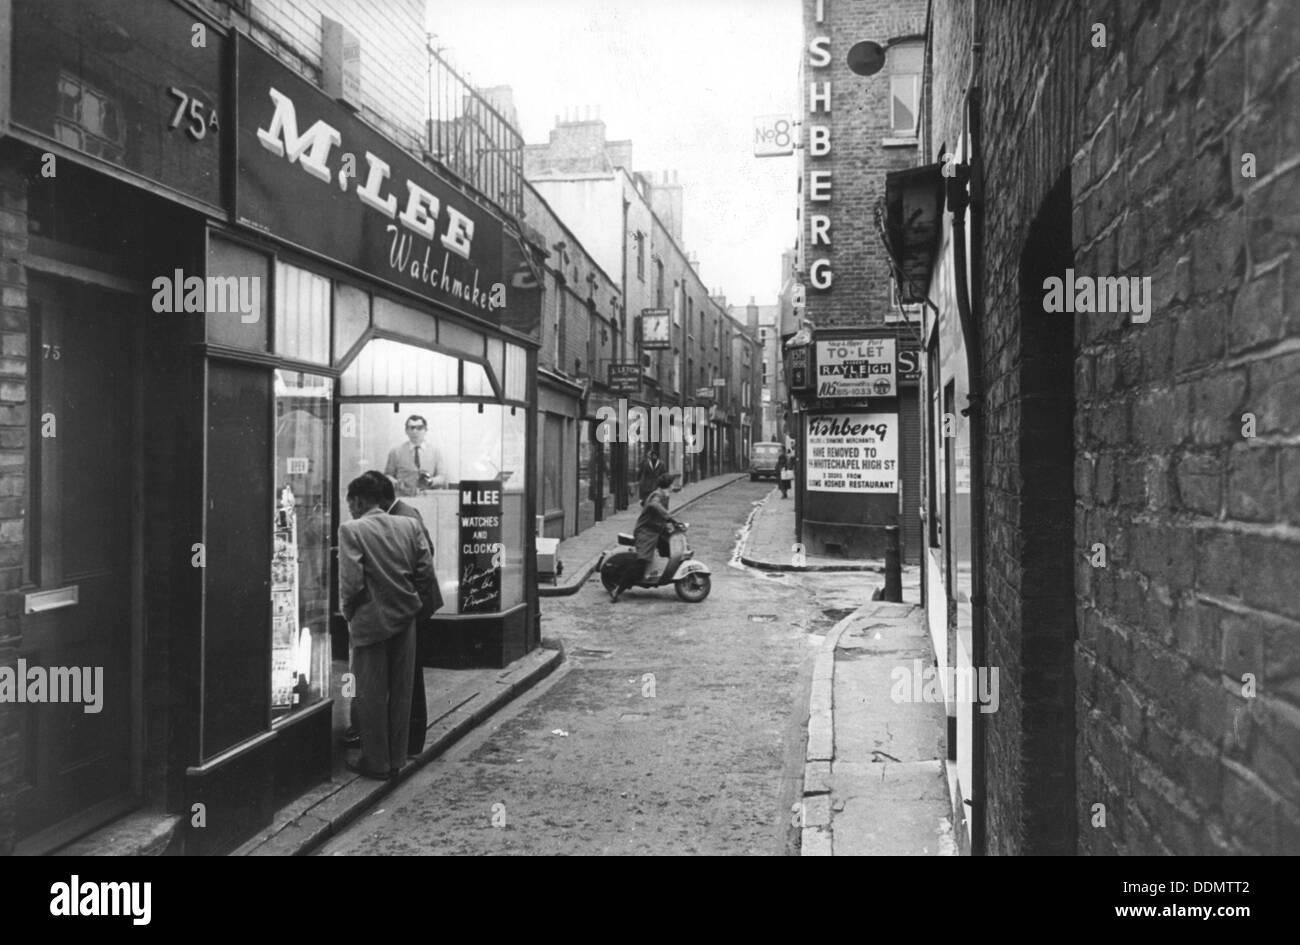 Jewish businesses threatened with closure, Stepney, London, 1967. - Stock Image